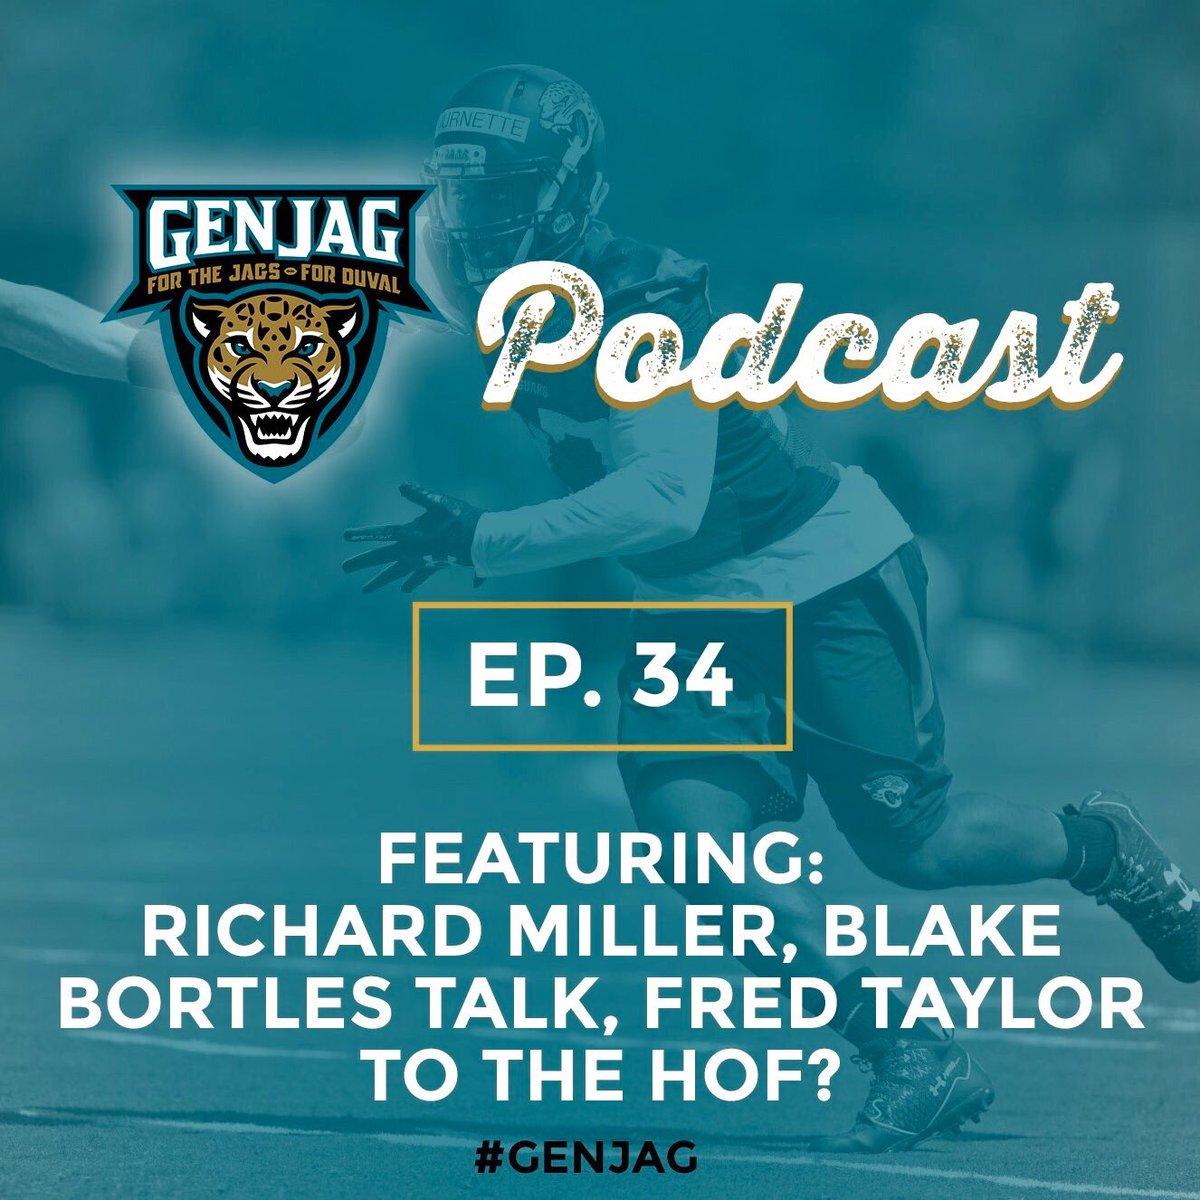 The latest episode of the #GenJag podcast ft. @MillerOnSports  http://www. genjag.com/jacksonville-j aguars-news/genjag-podcast-ep-34-ft-richard-miller &nbsp; …  #Jaguars <br>http://pic.twitter.com/QCocnigxuh